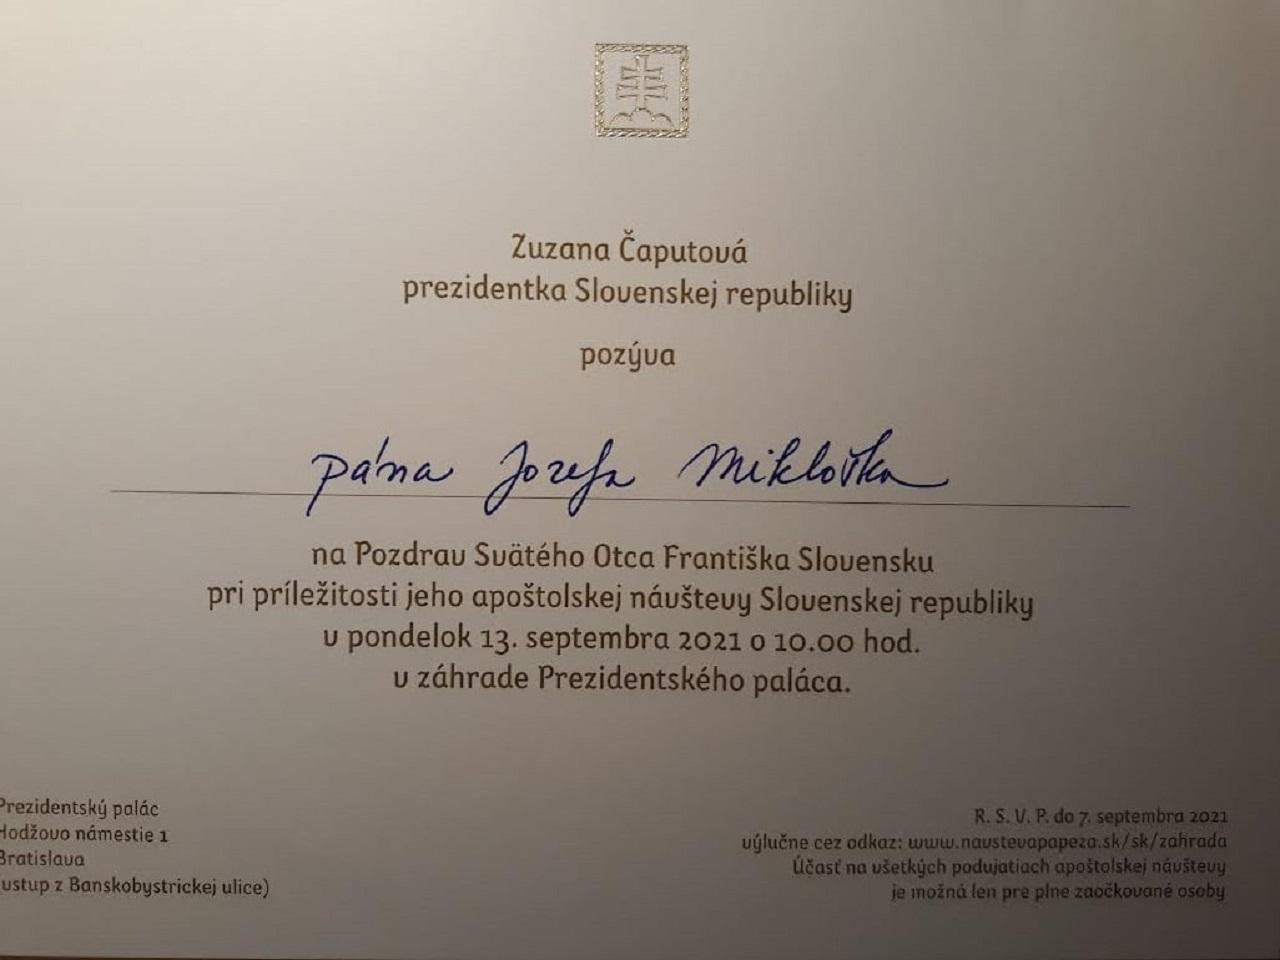 pozvánka Jozef Mikloško